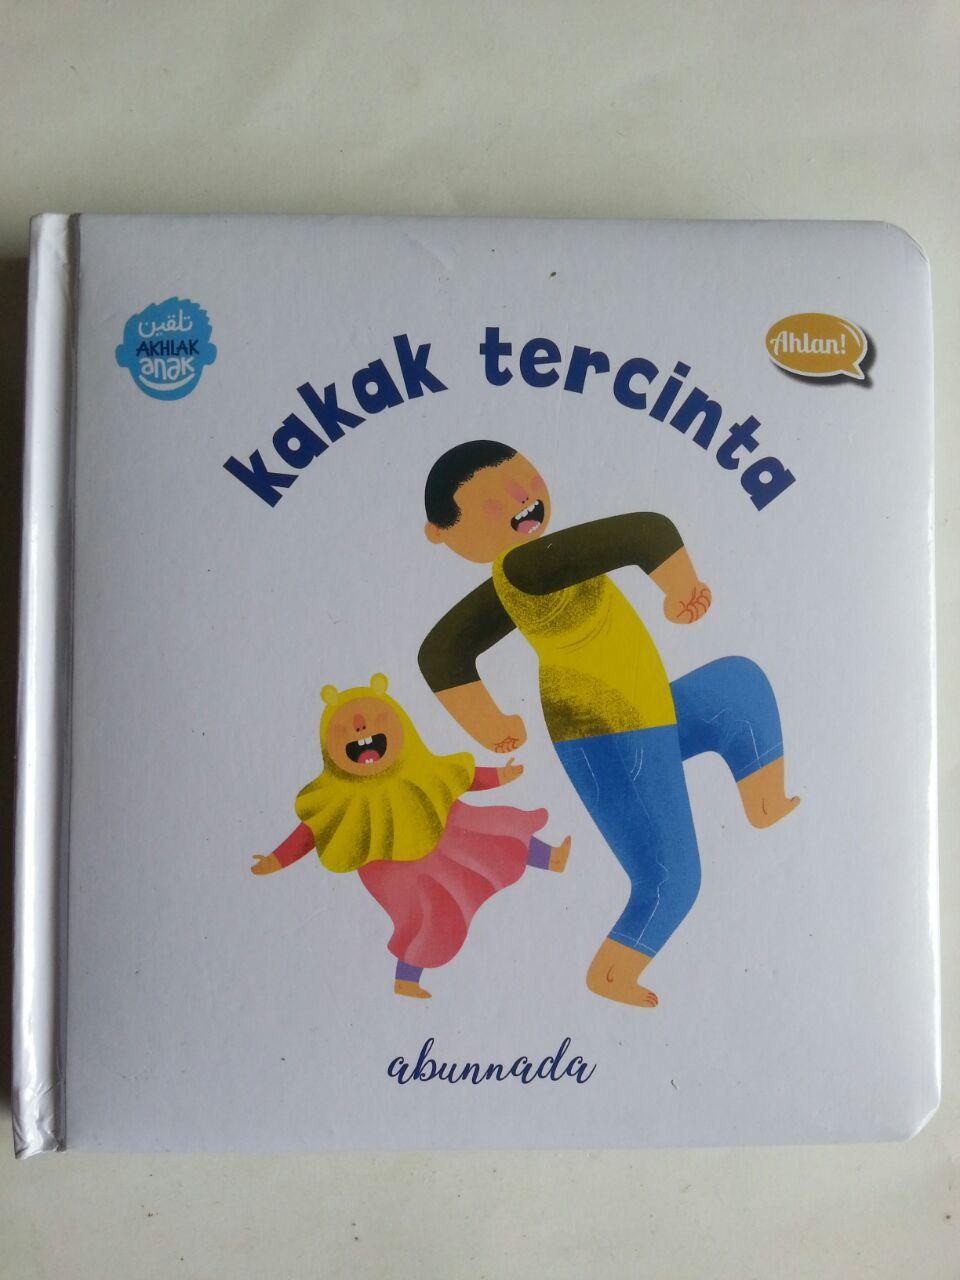 Buku Anak Boarbook Kakak Tercinta cover 2